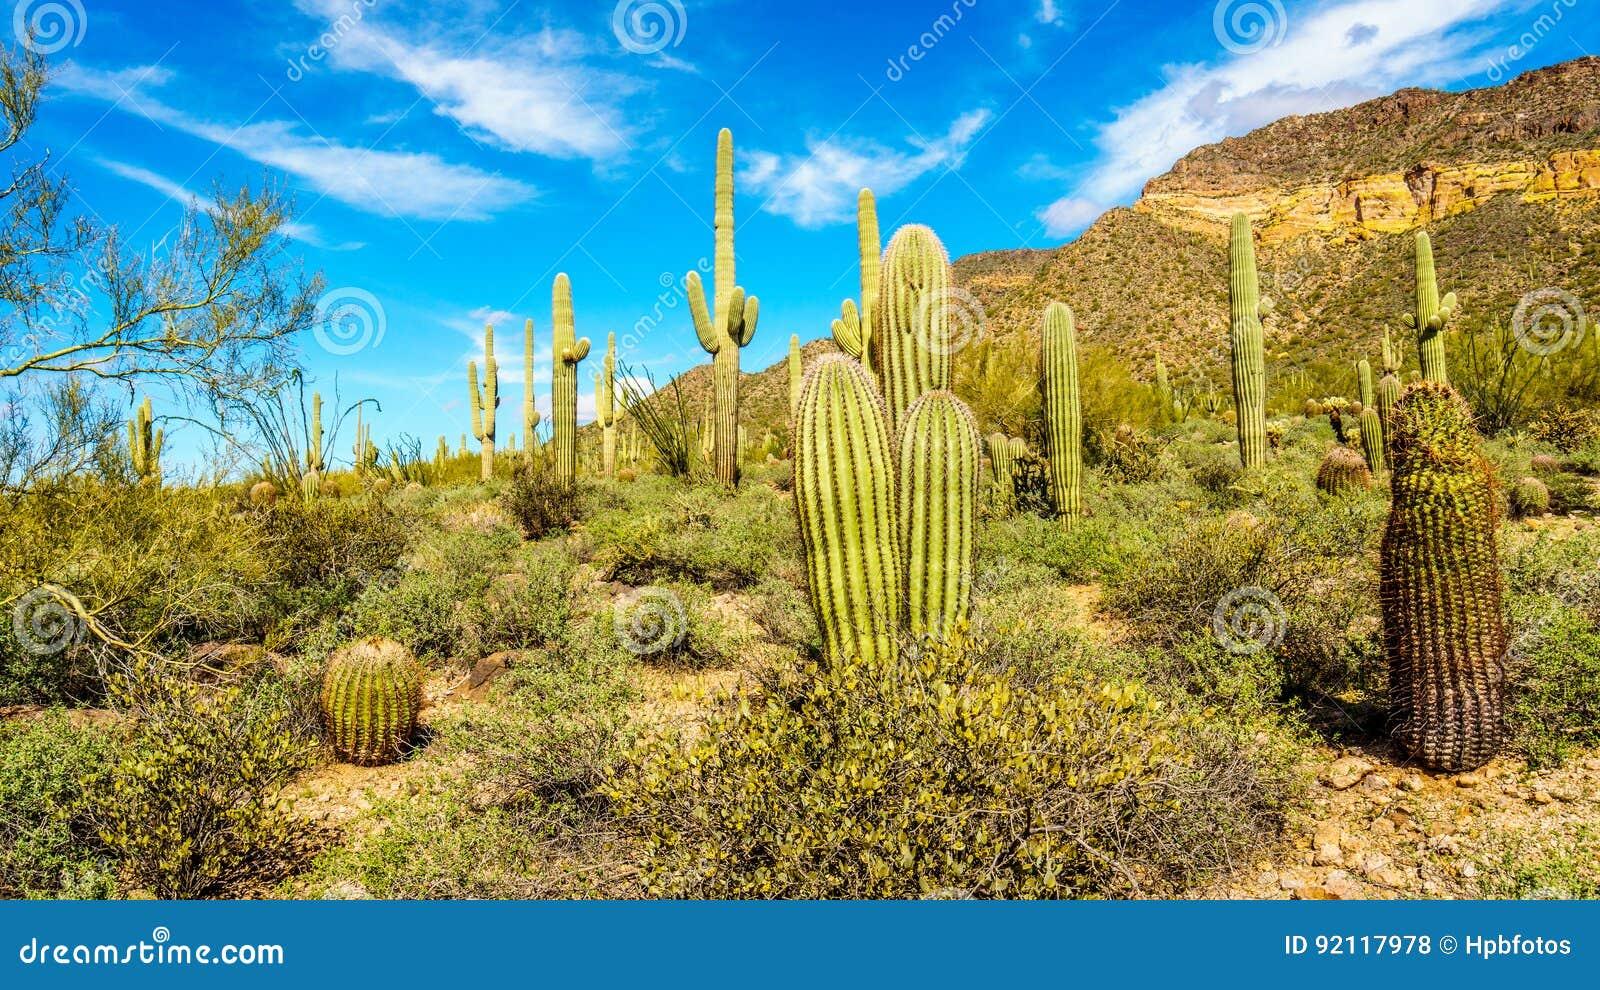 Barrel and Saguaro cacti in the semi desert landscape of Usery Mountain Regional Park near Phoenix Arizona